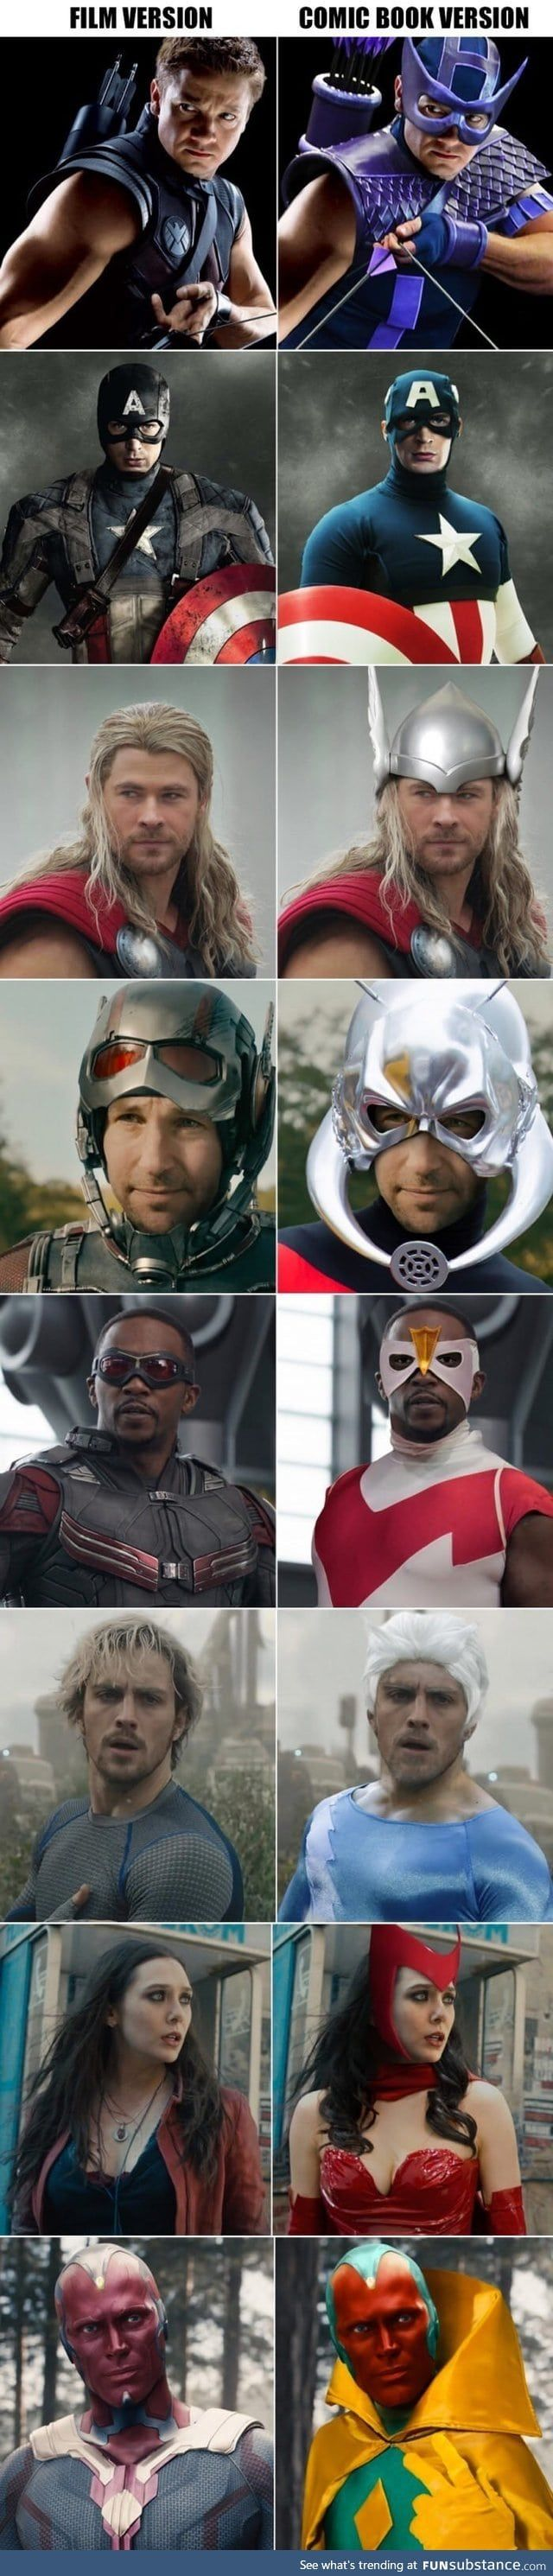 Avengers film vs comic book version #comicbooks